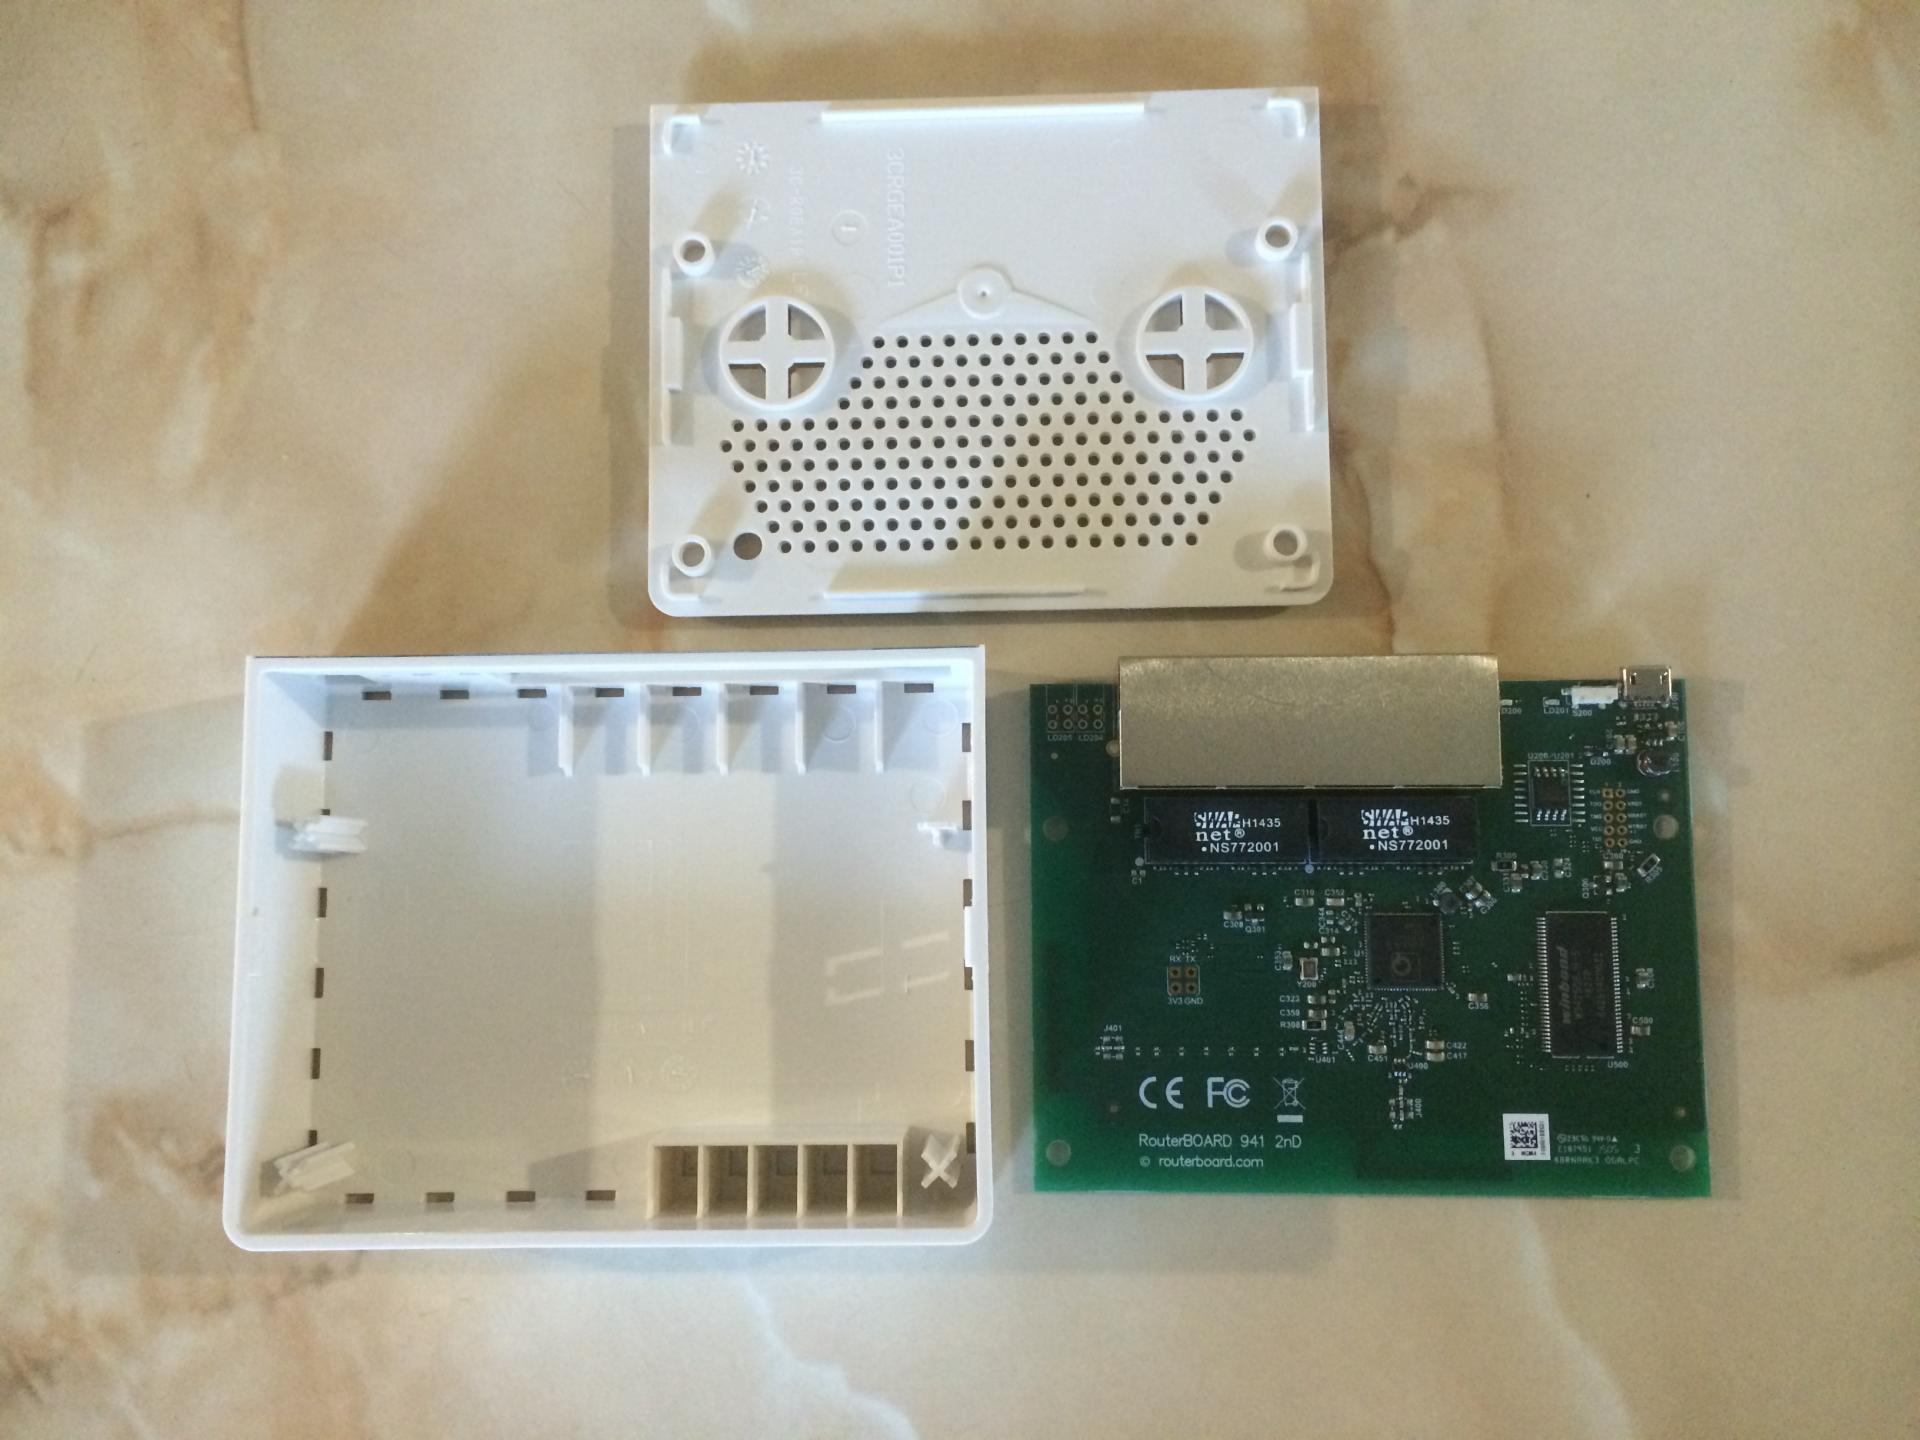 Mikrotik Hap Lite Rb941 2nd Wi Fi Rb 941 Post 19642 0 54738800 1434794090 Thumb